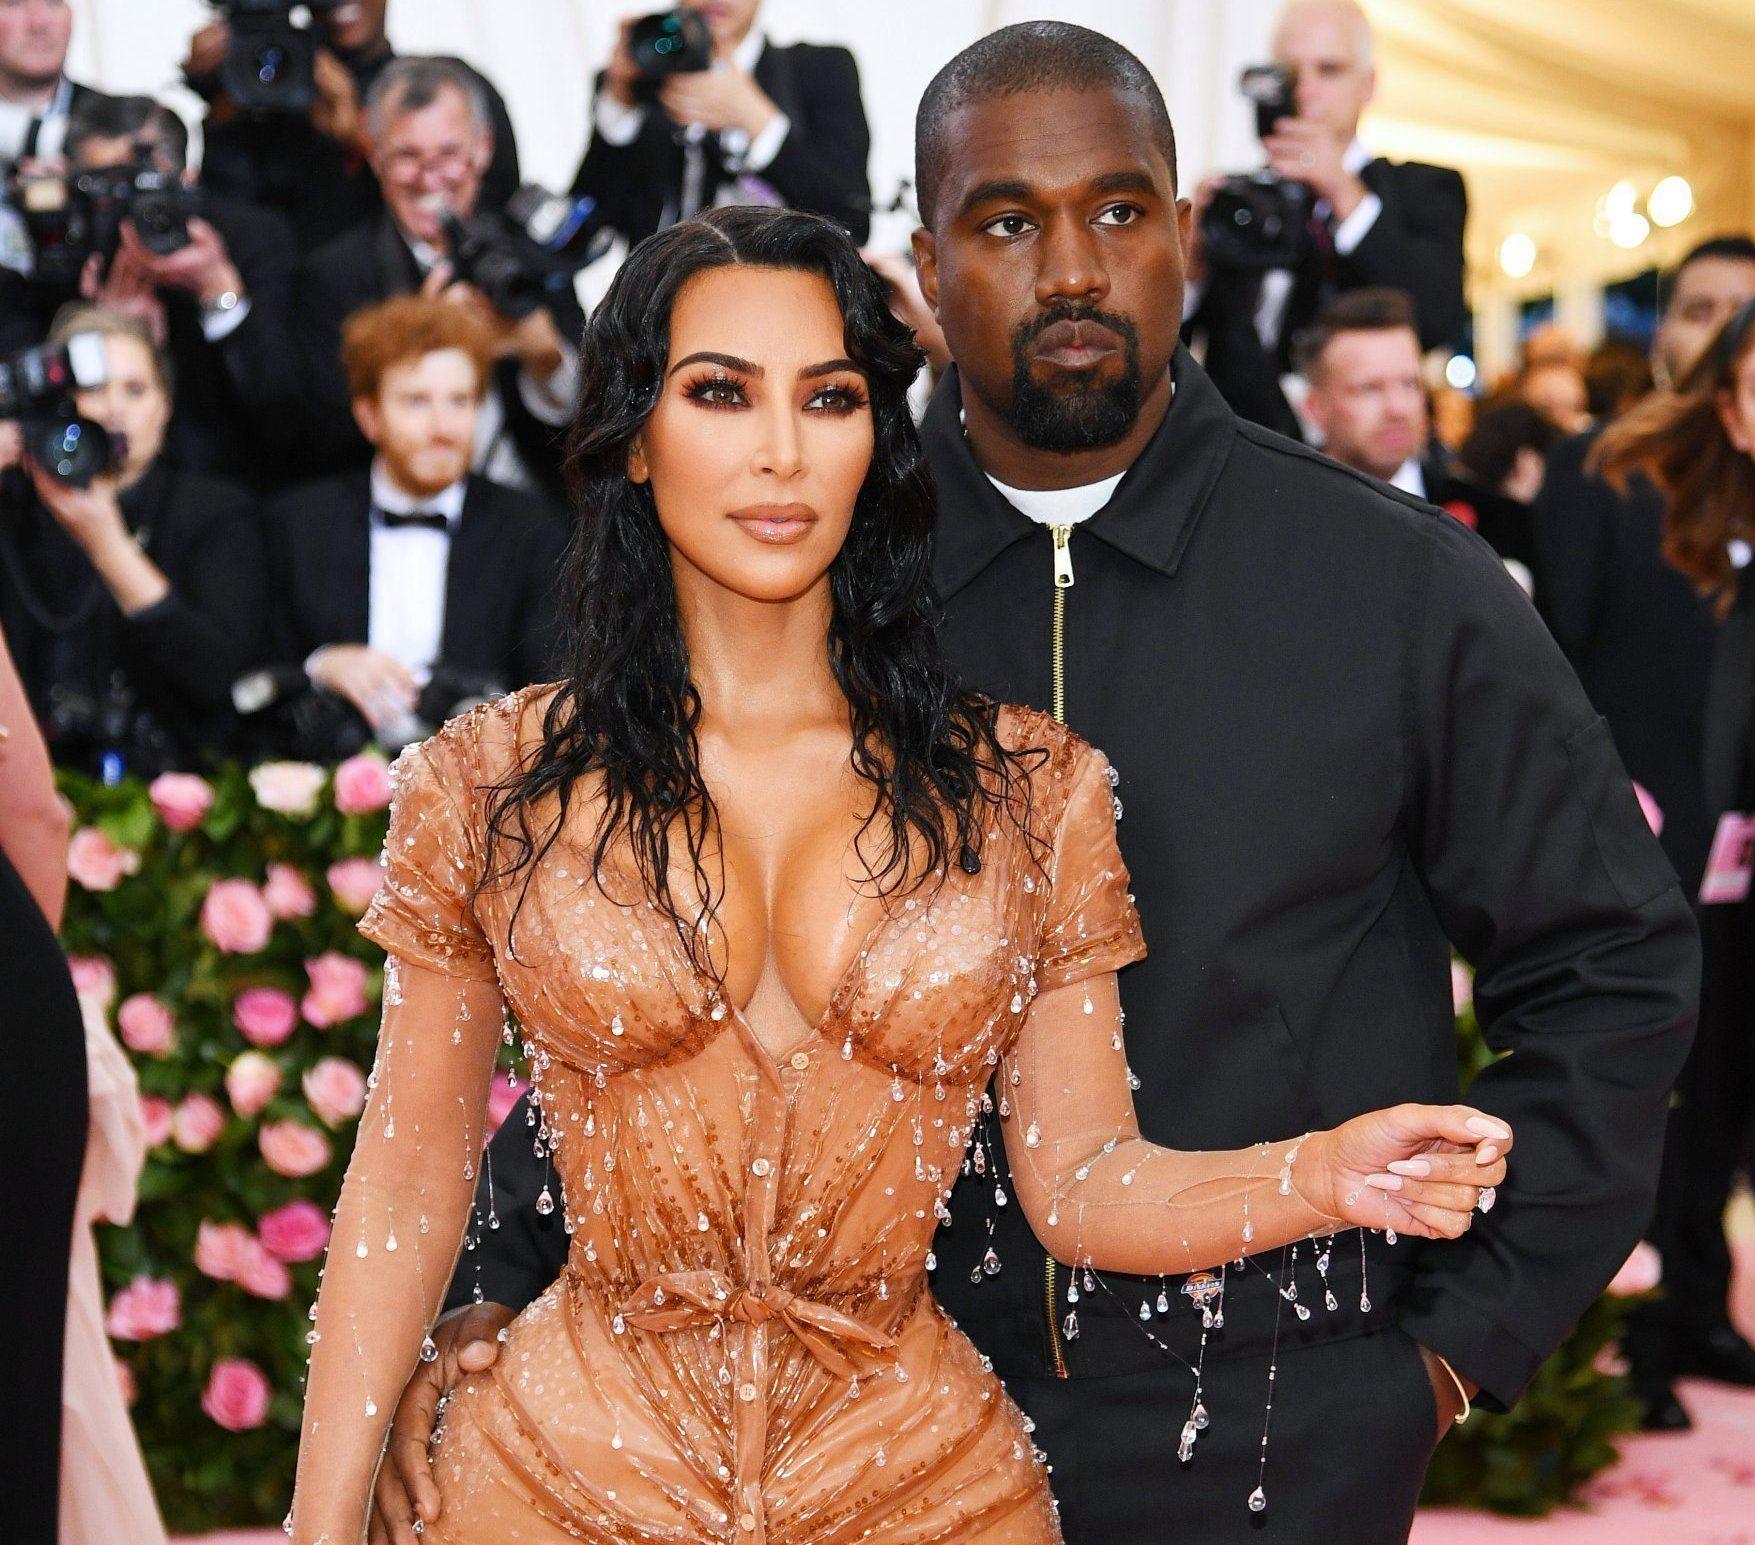 KUWK: Kanye And Kim Fight Over Her Met Gala Dress